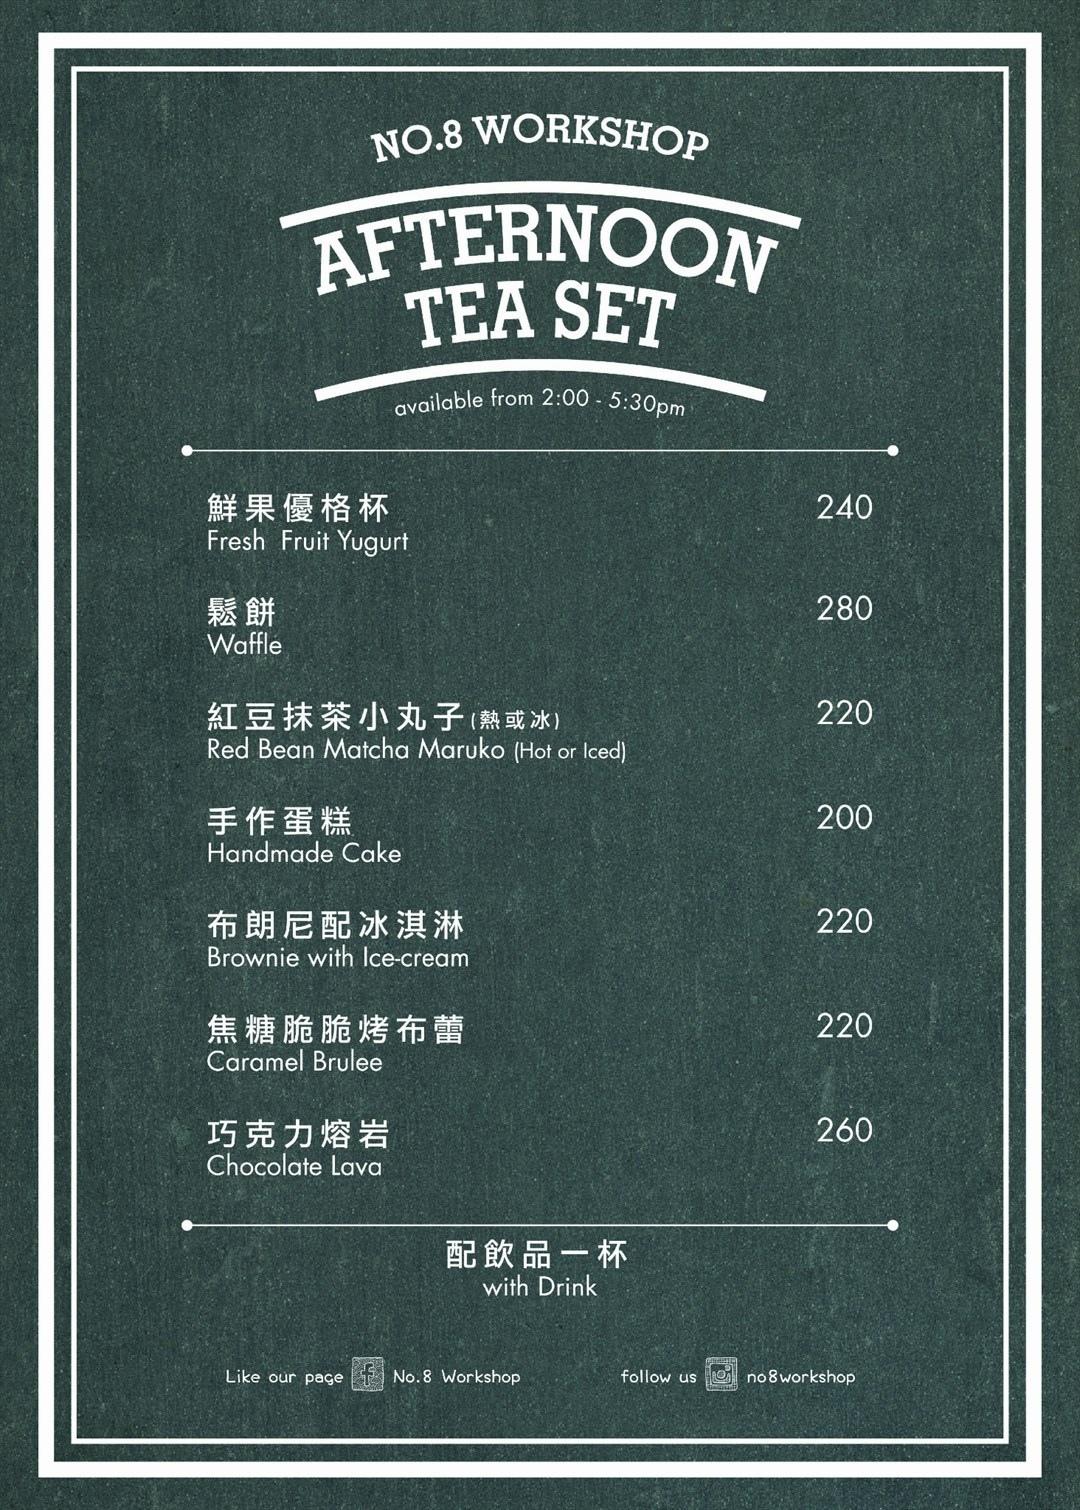 No.8 Workshop 捌號工作室-no8workshop-menu-afternoon